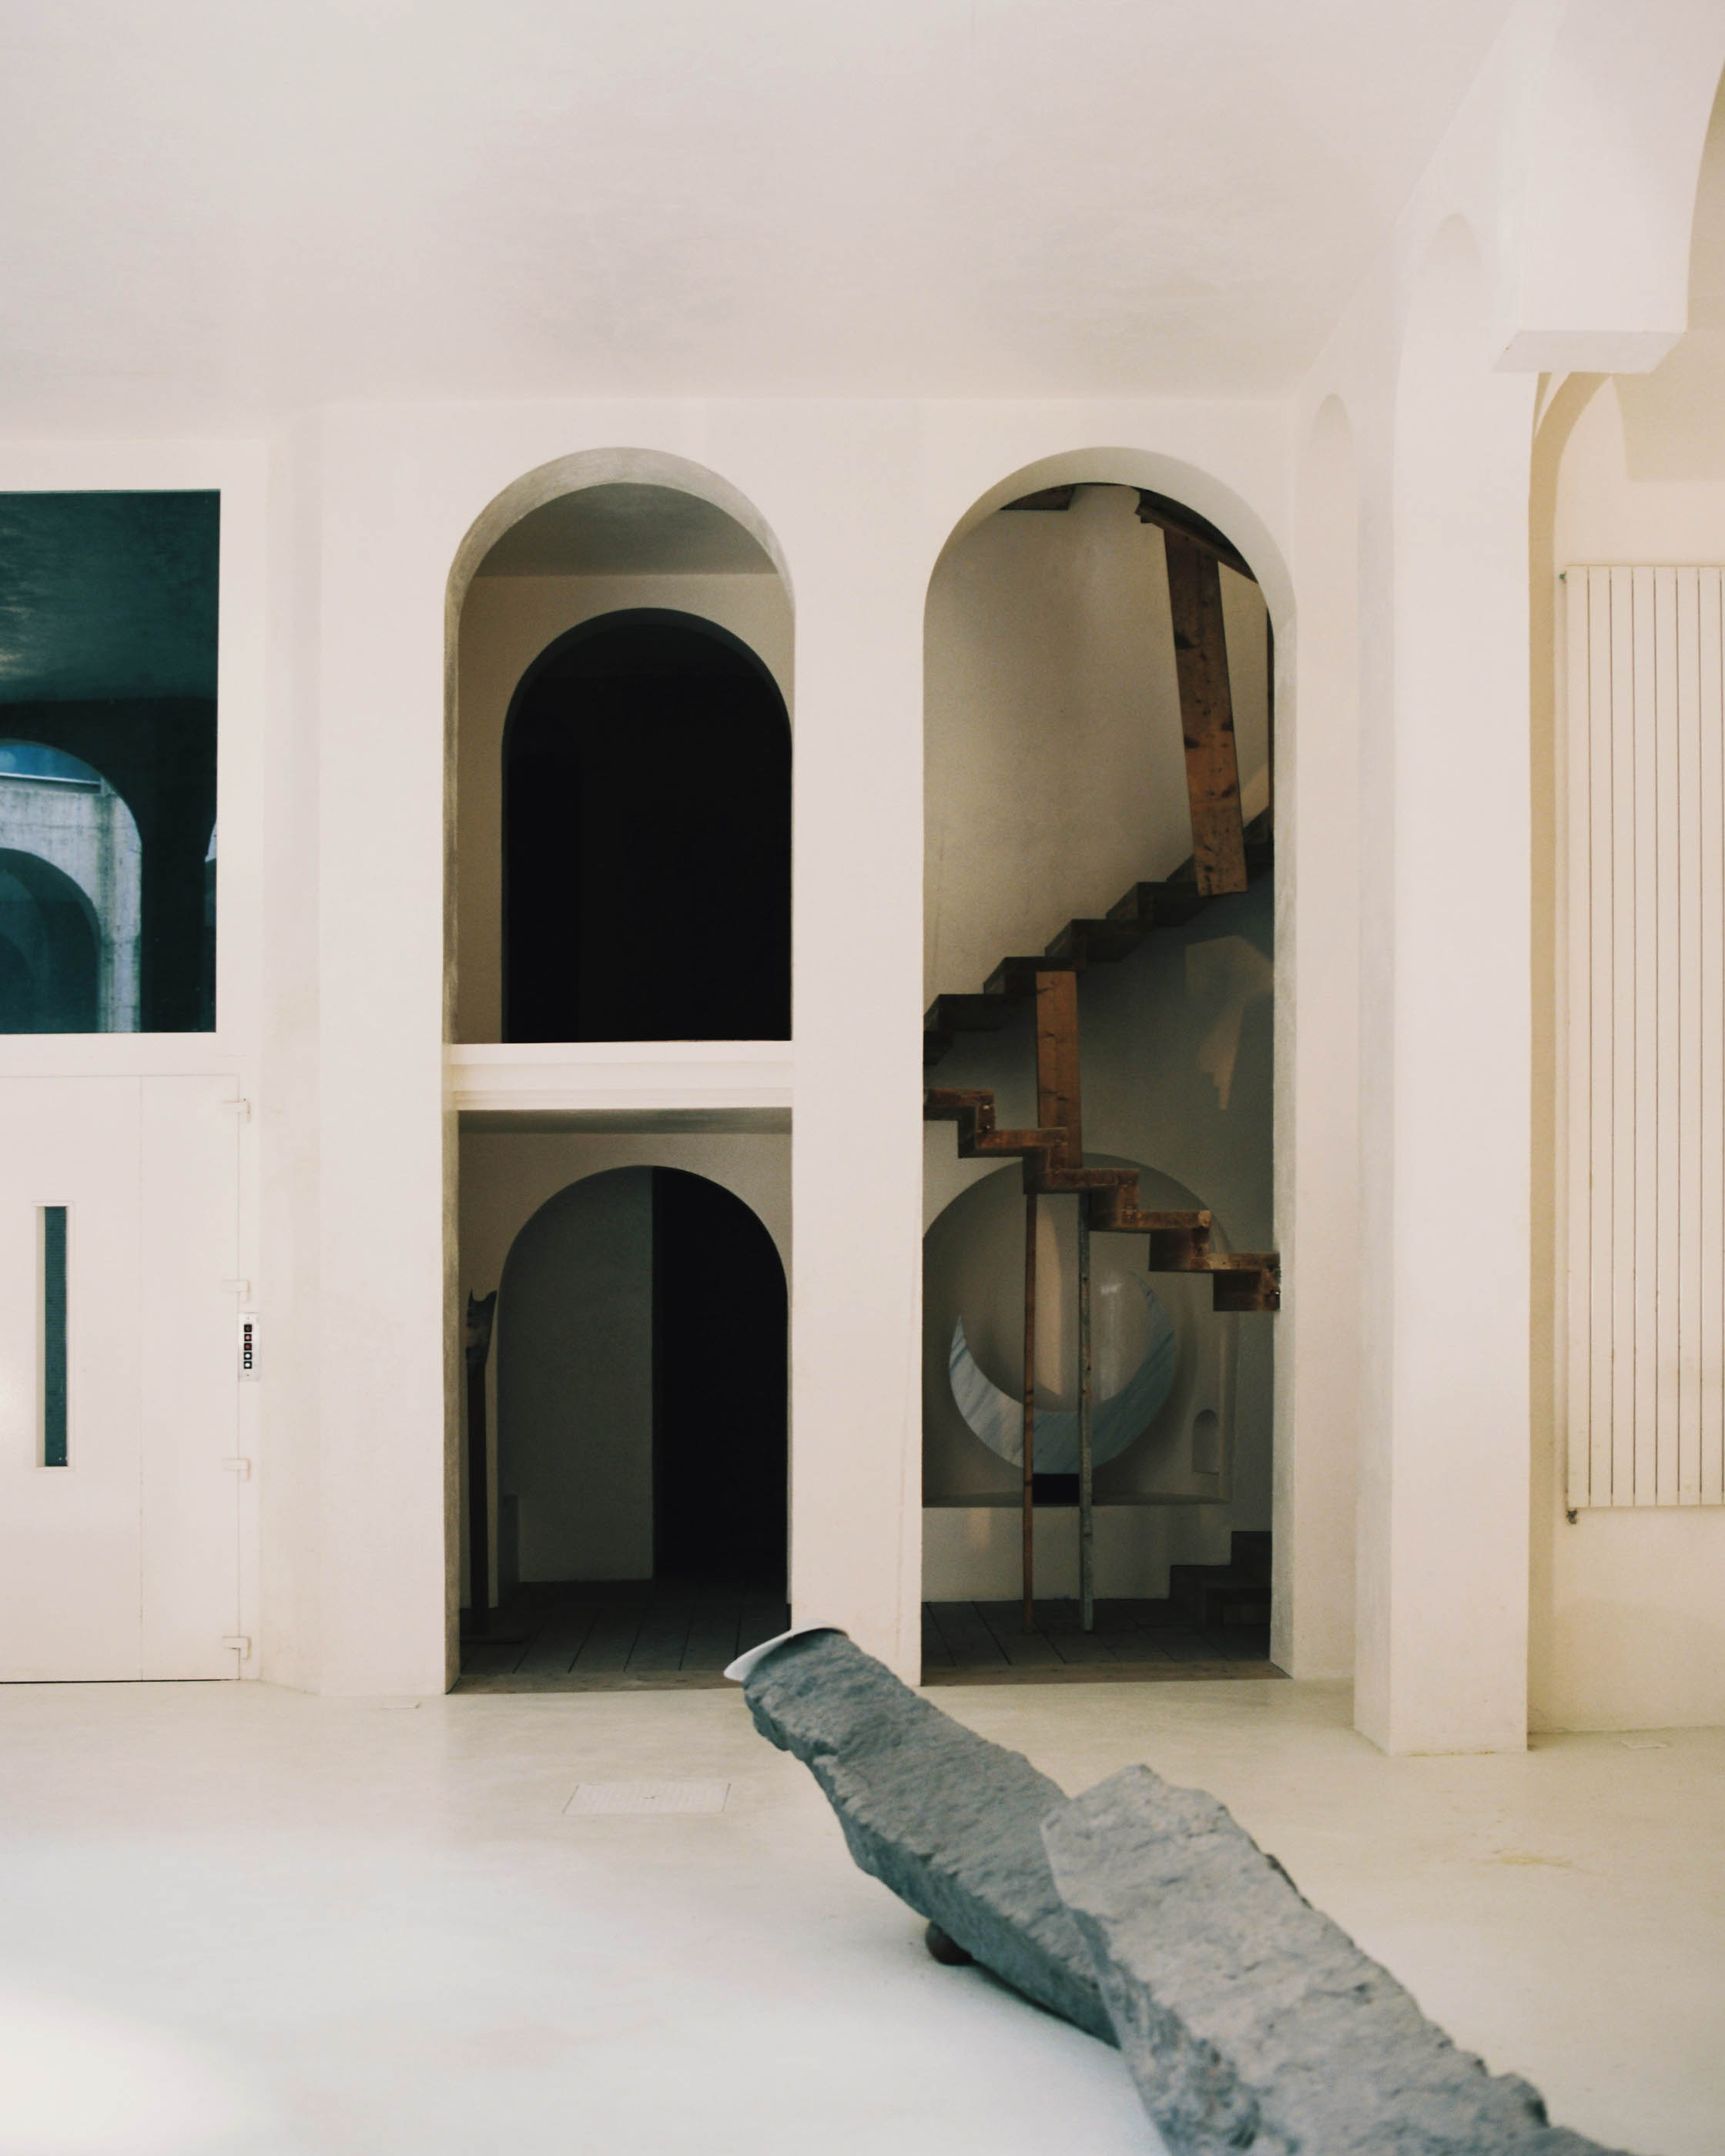 salva-lopez-editorial-wsj-xavier-corbero-house-46.jpg